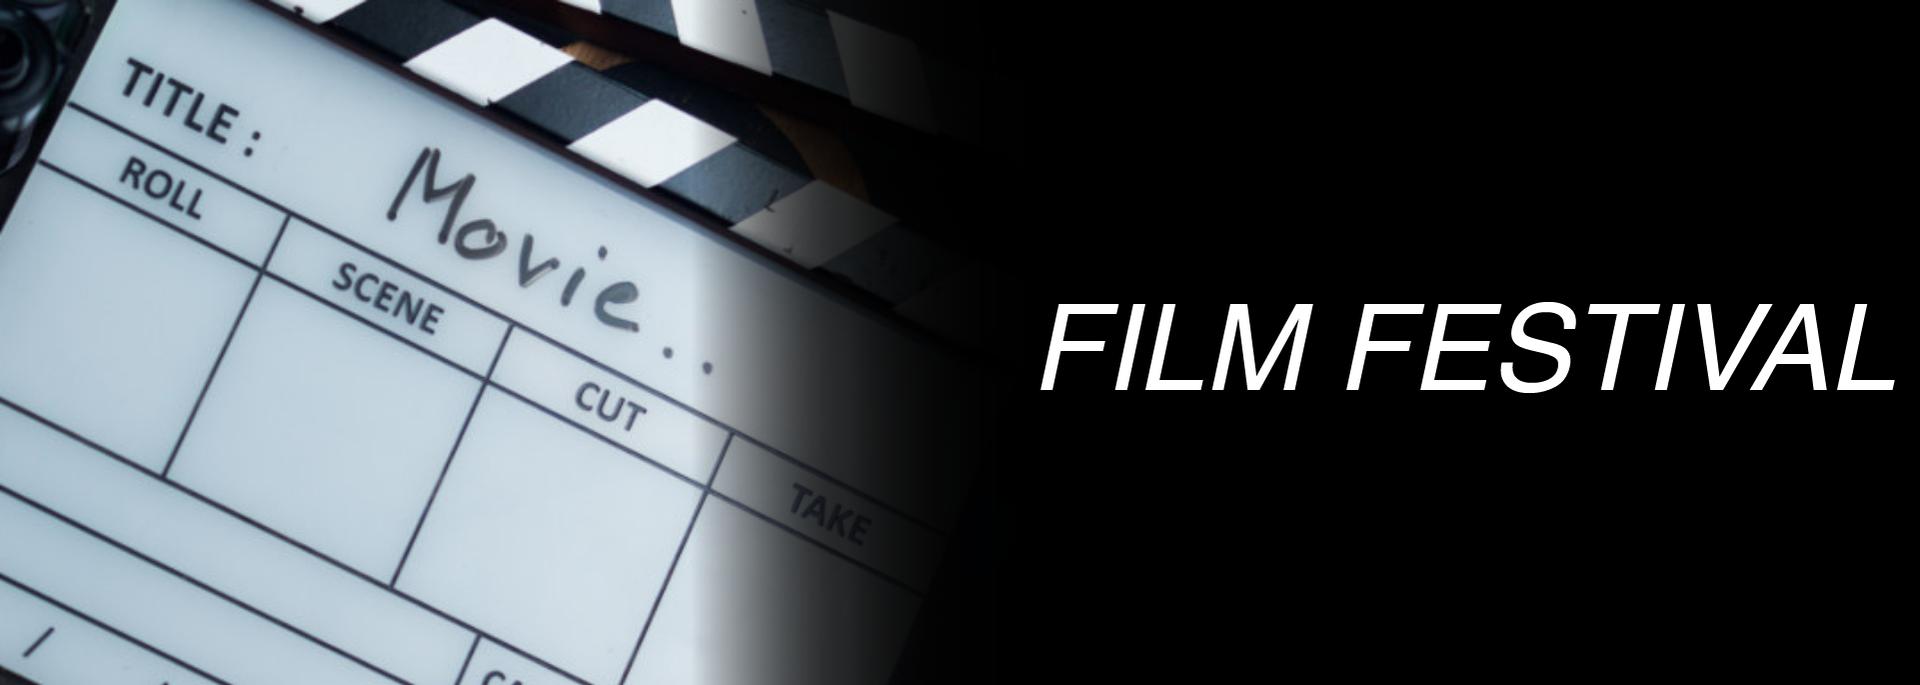 FILM FESTIVAL category